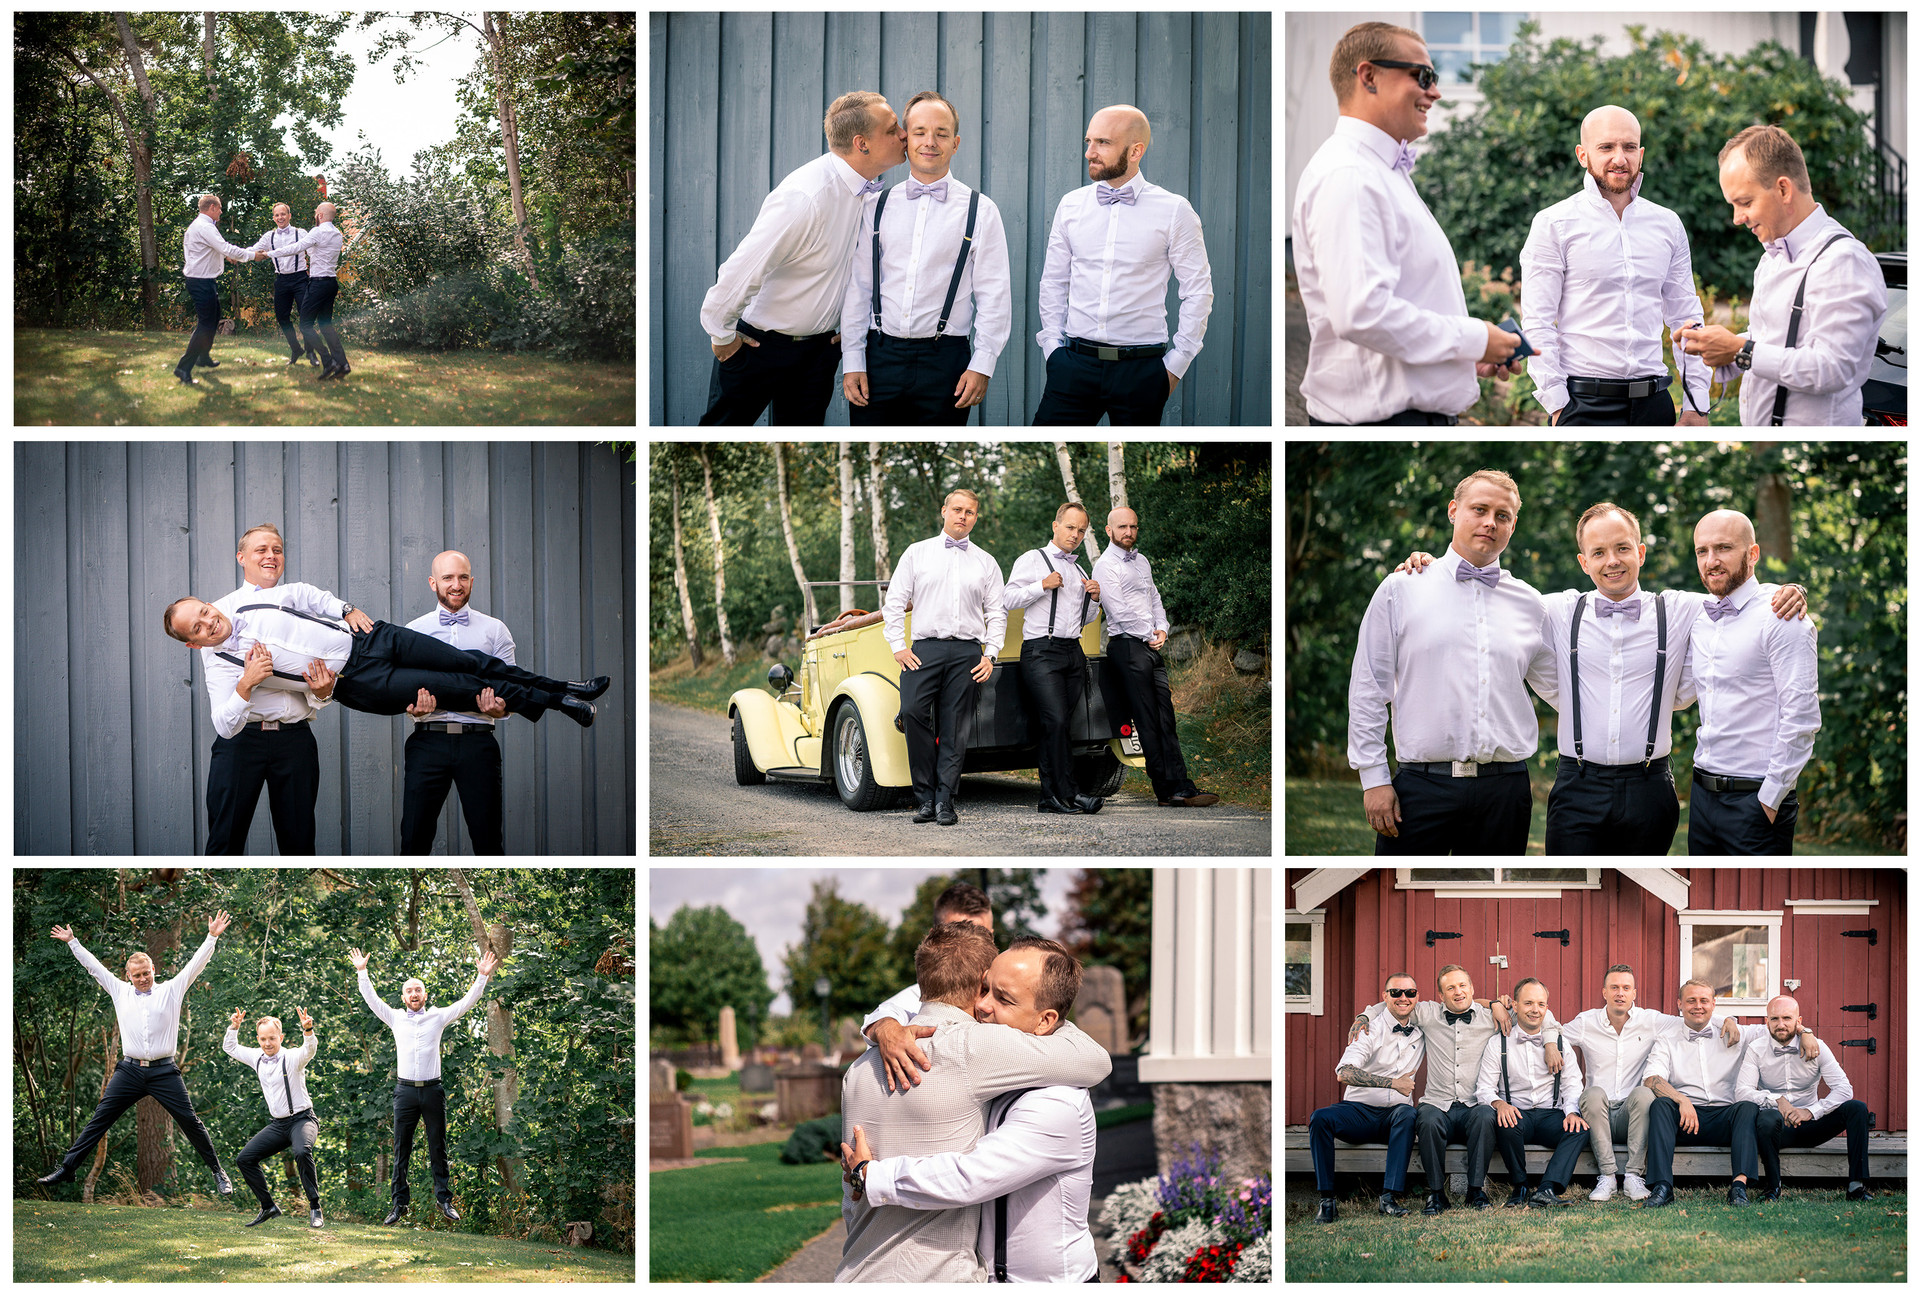 Wedding-Photography-Goteborg-02.jpg